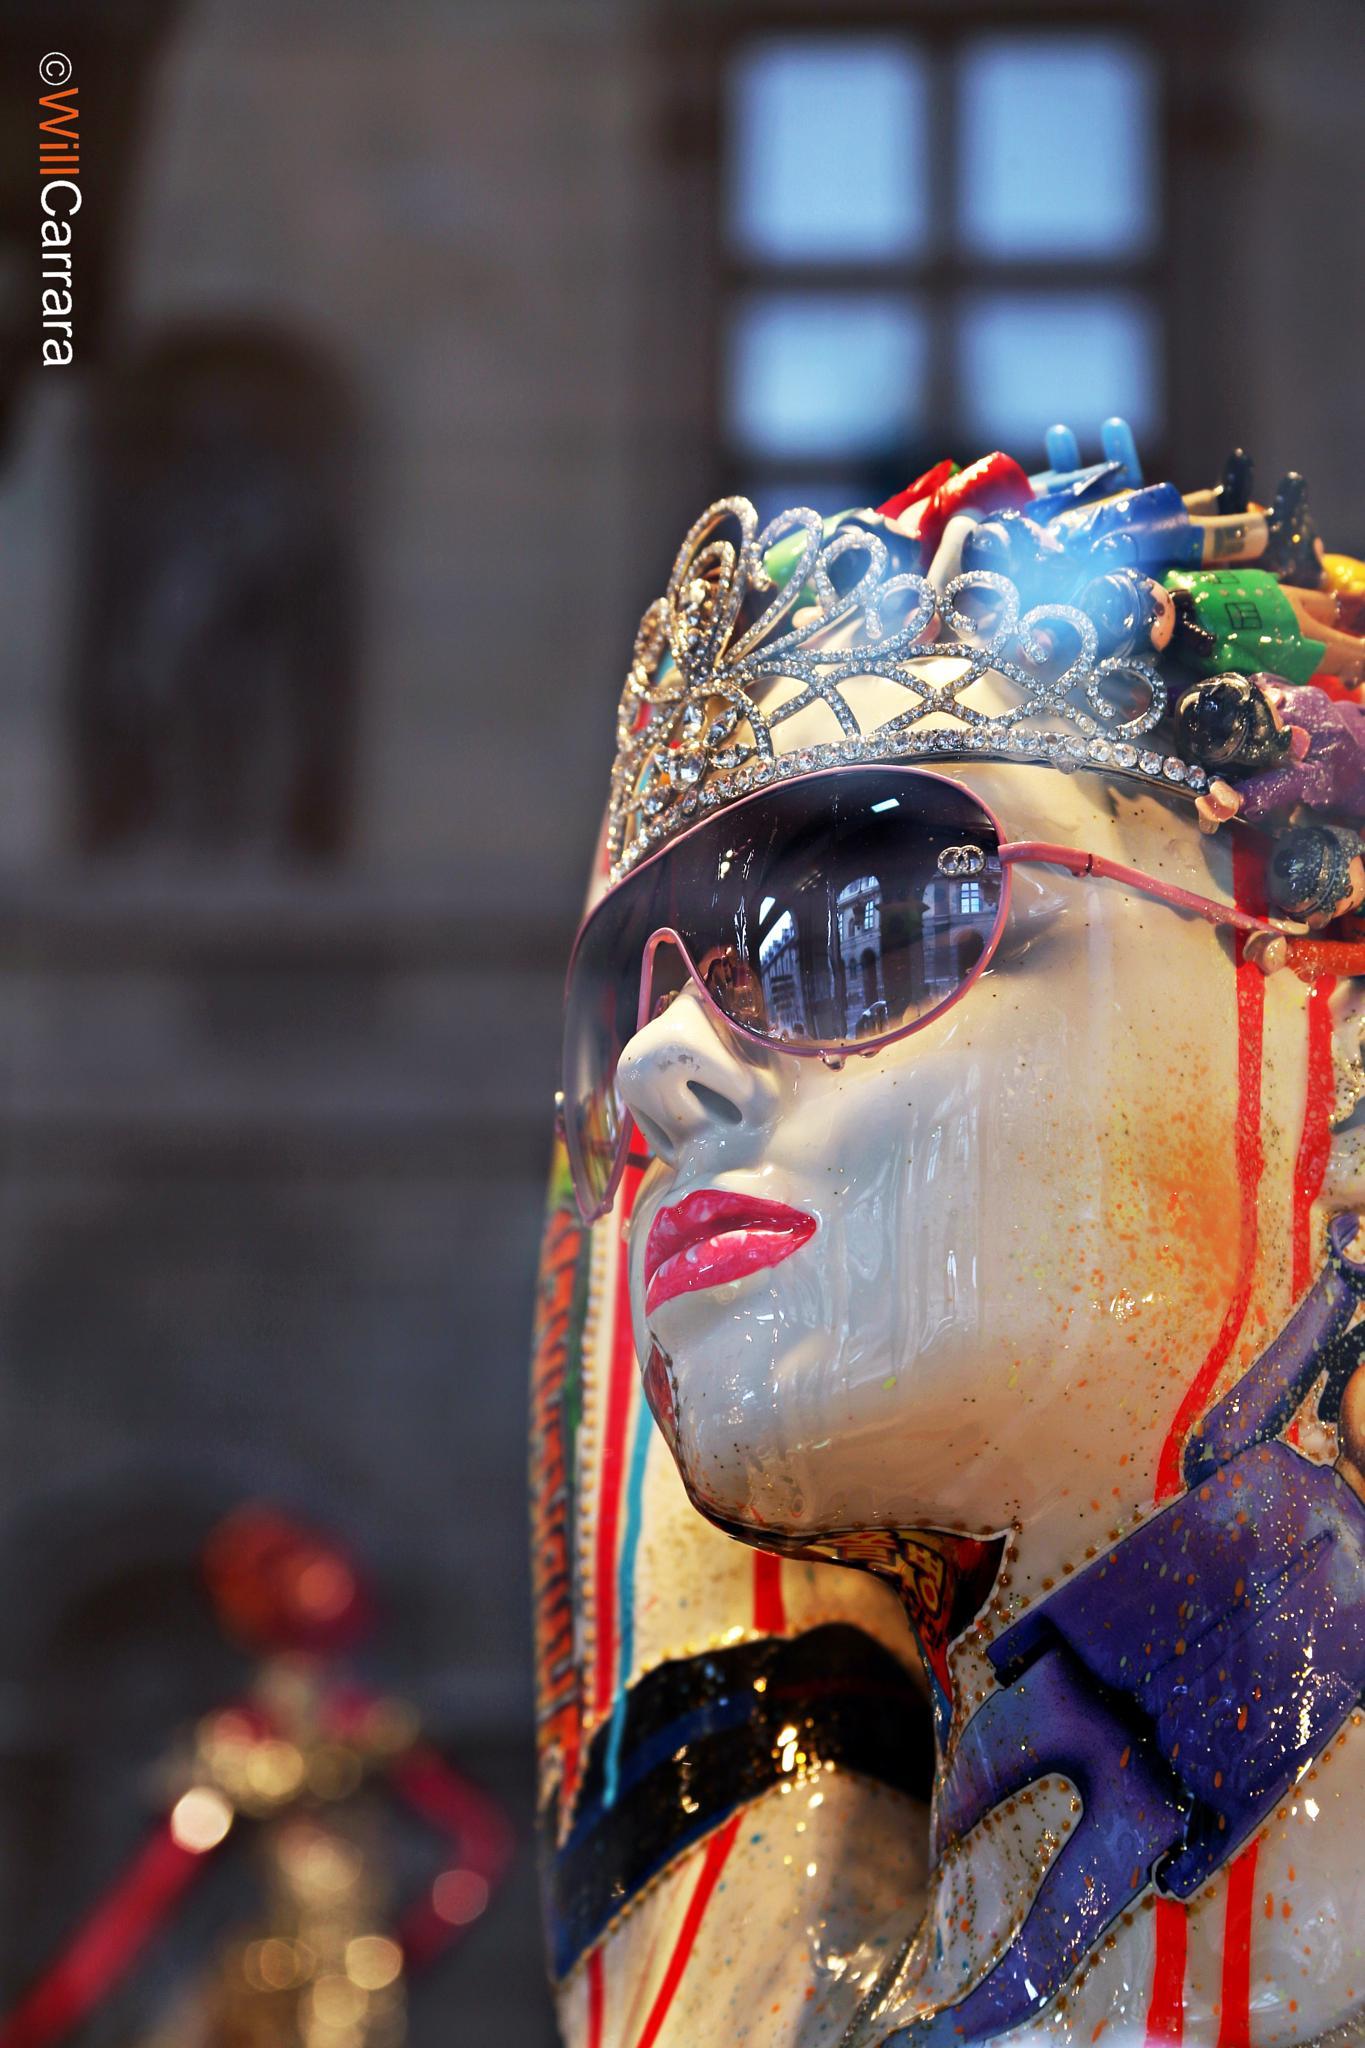 Vitrini Galeries Lafayette - Paris by Will Carrara Photographer